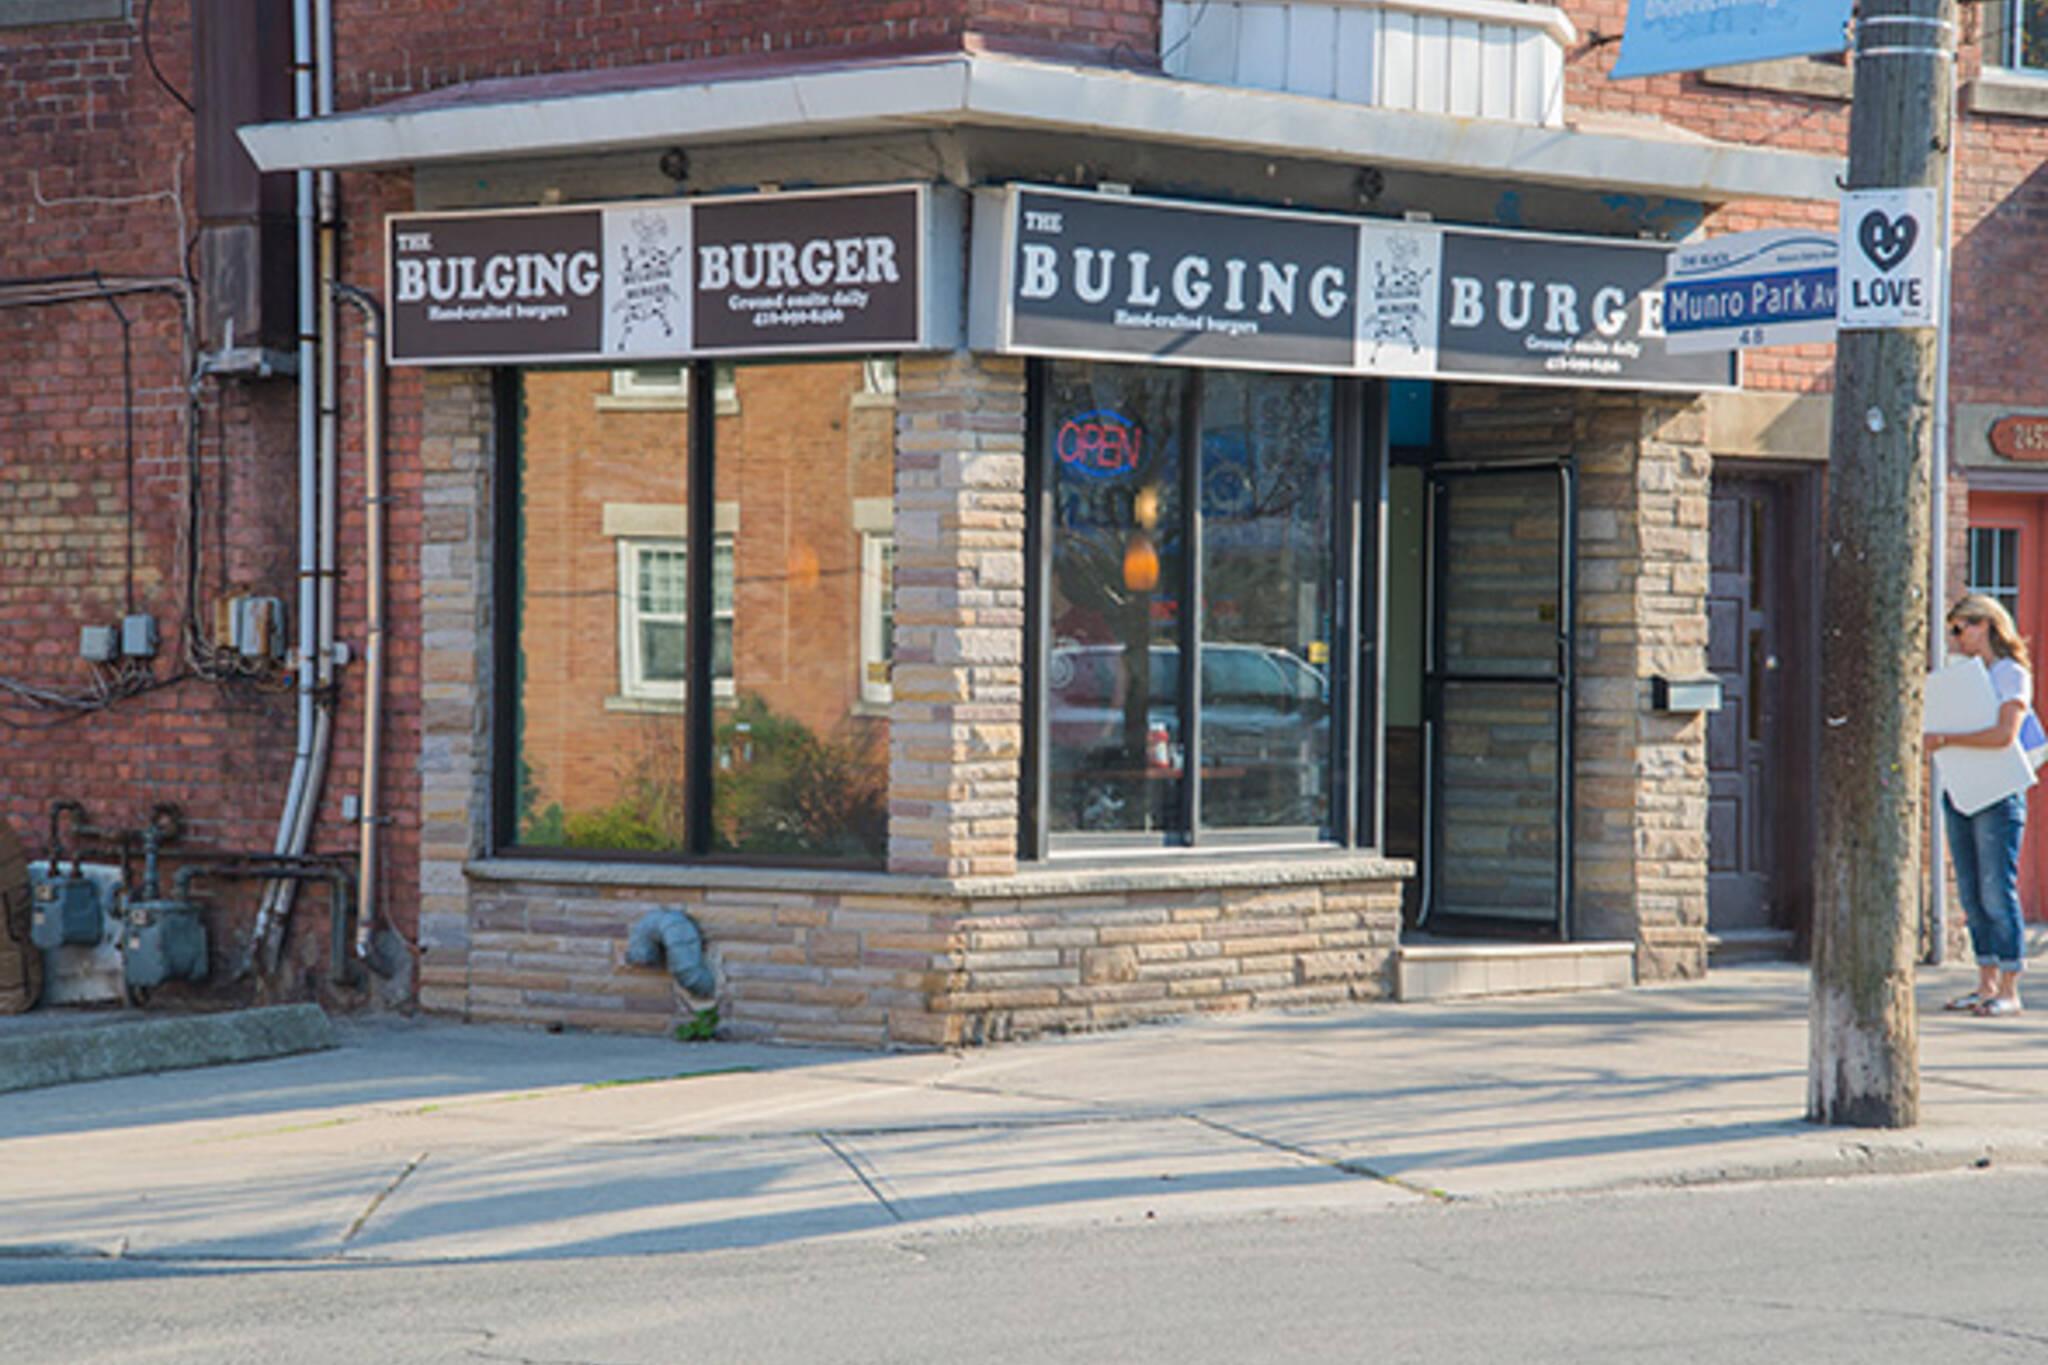 Bulging Burger